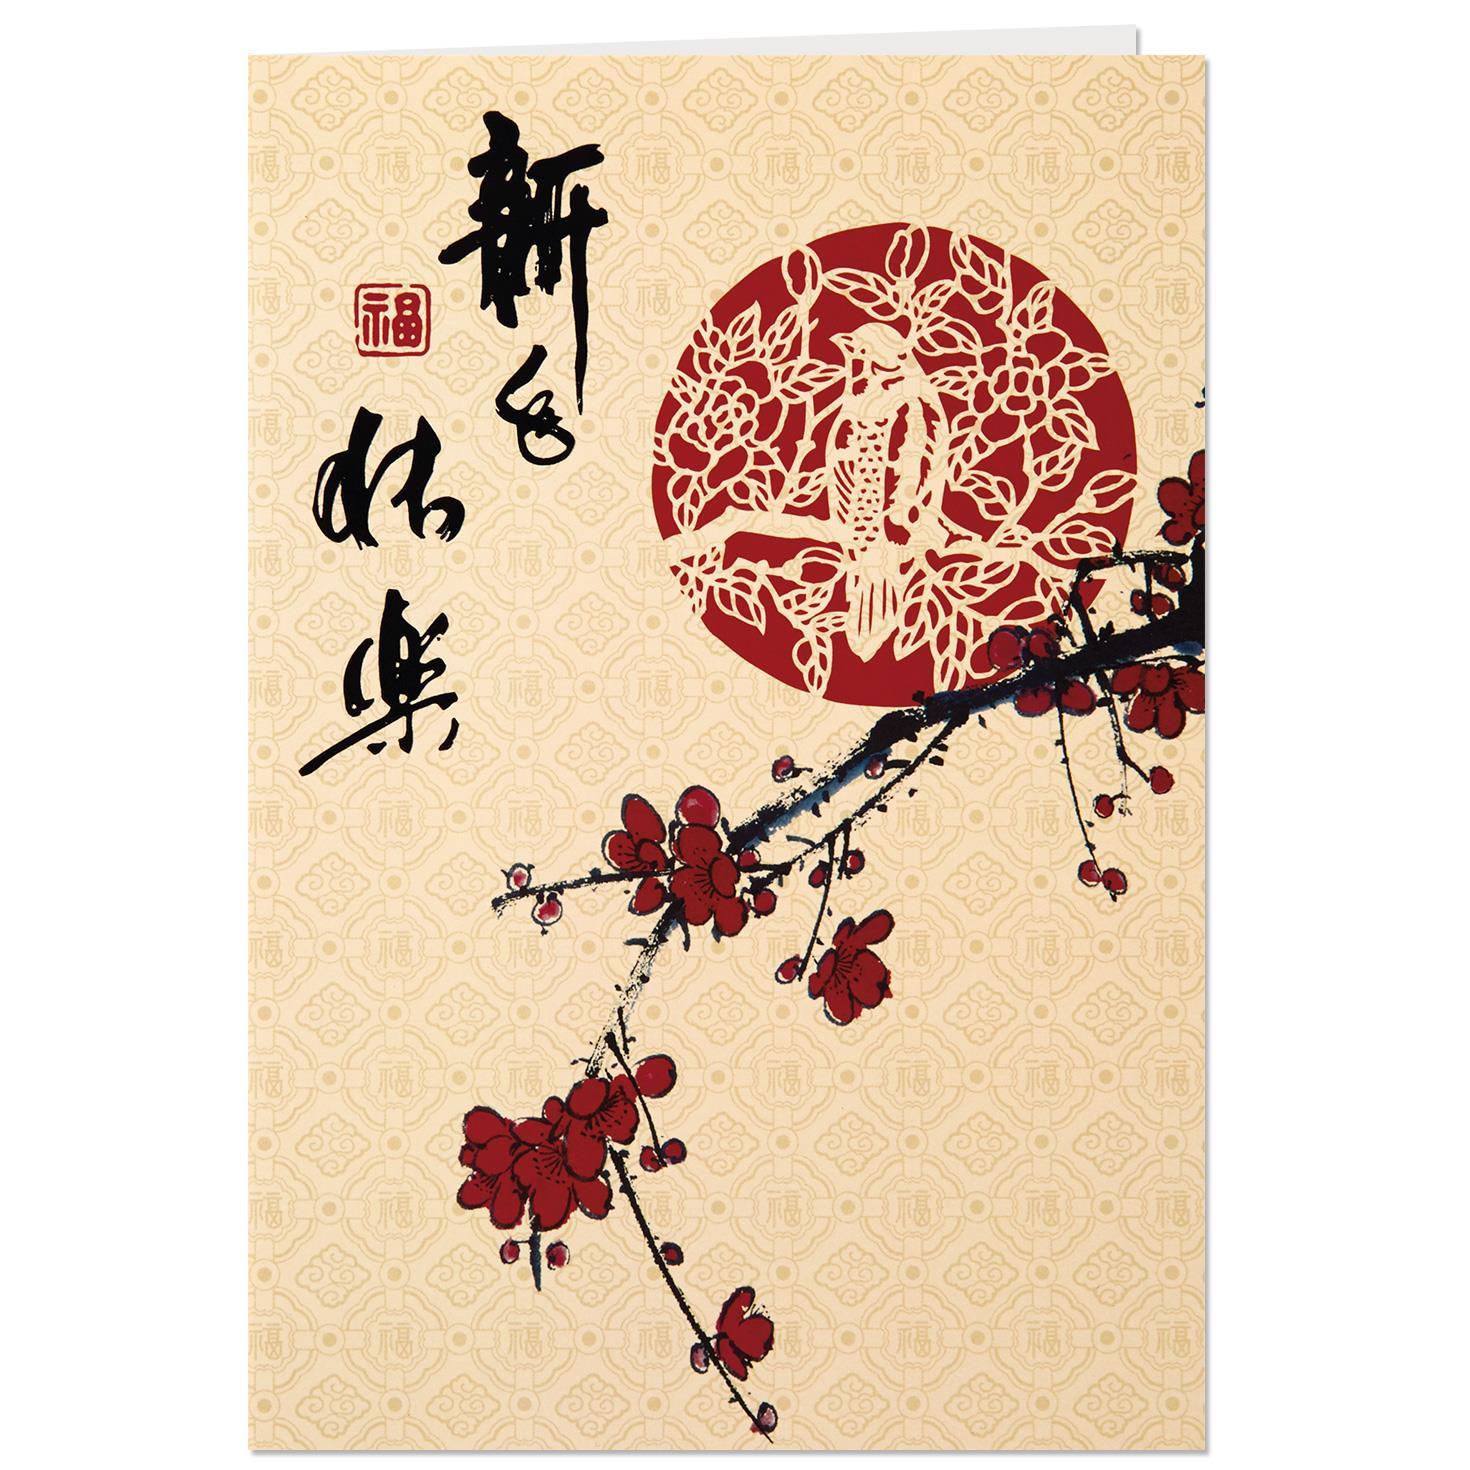 Lunar New Year Cards Demirediffusion